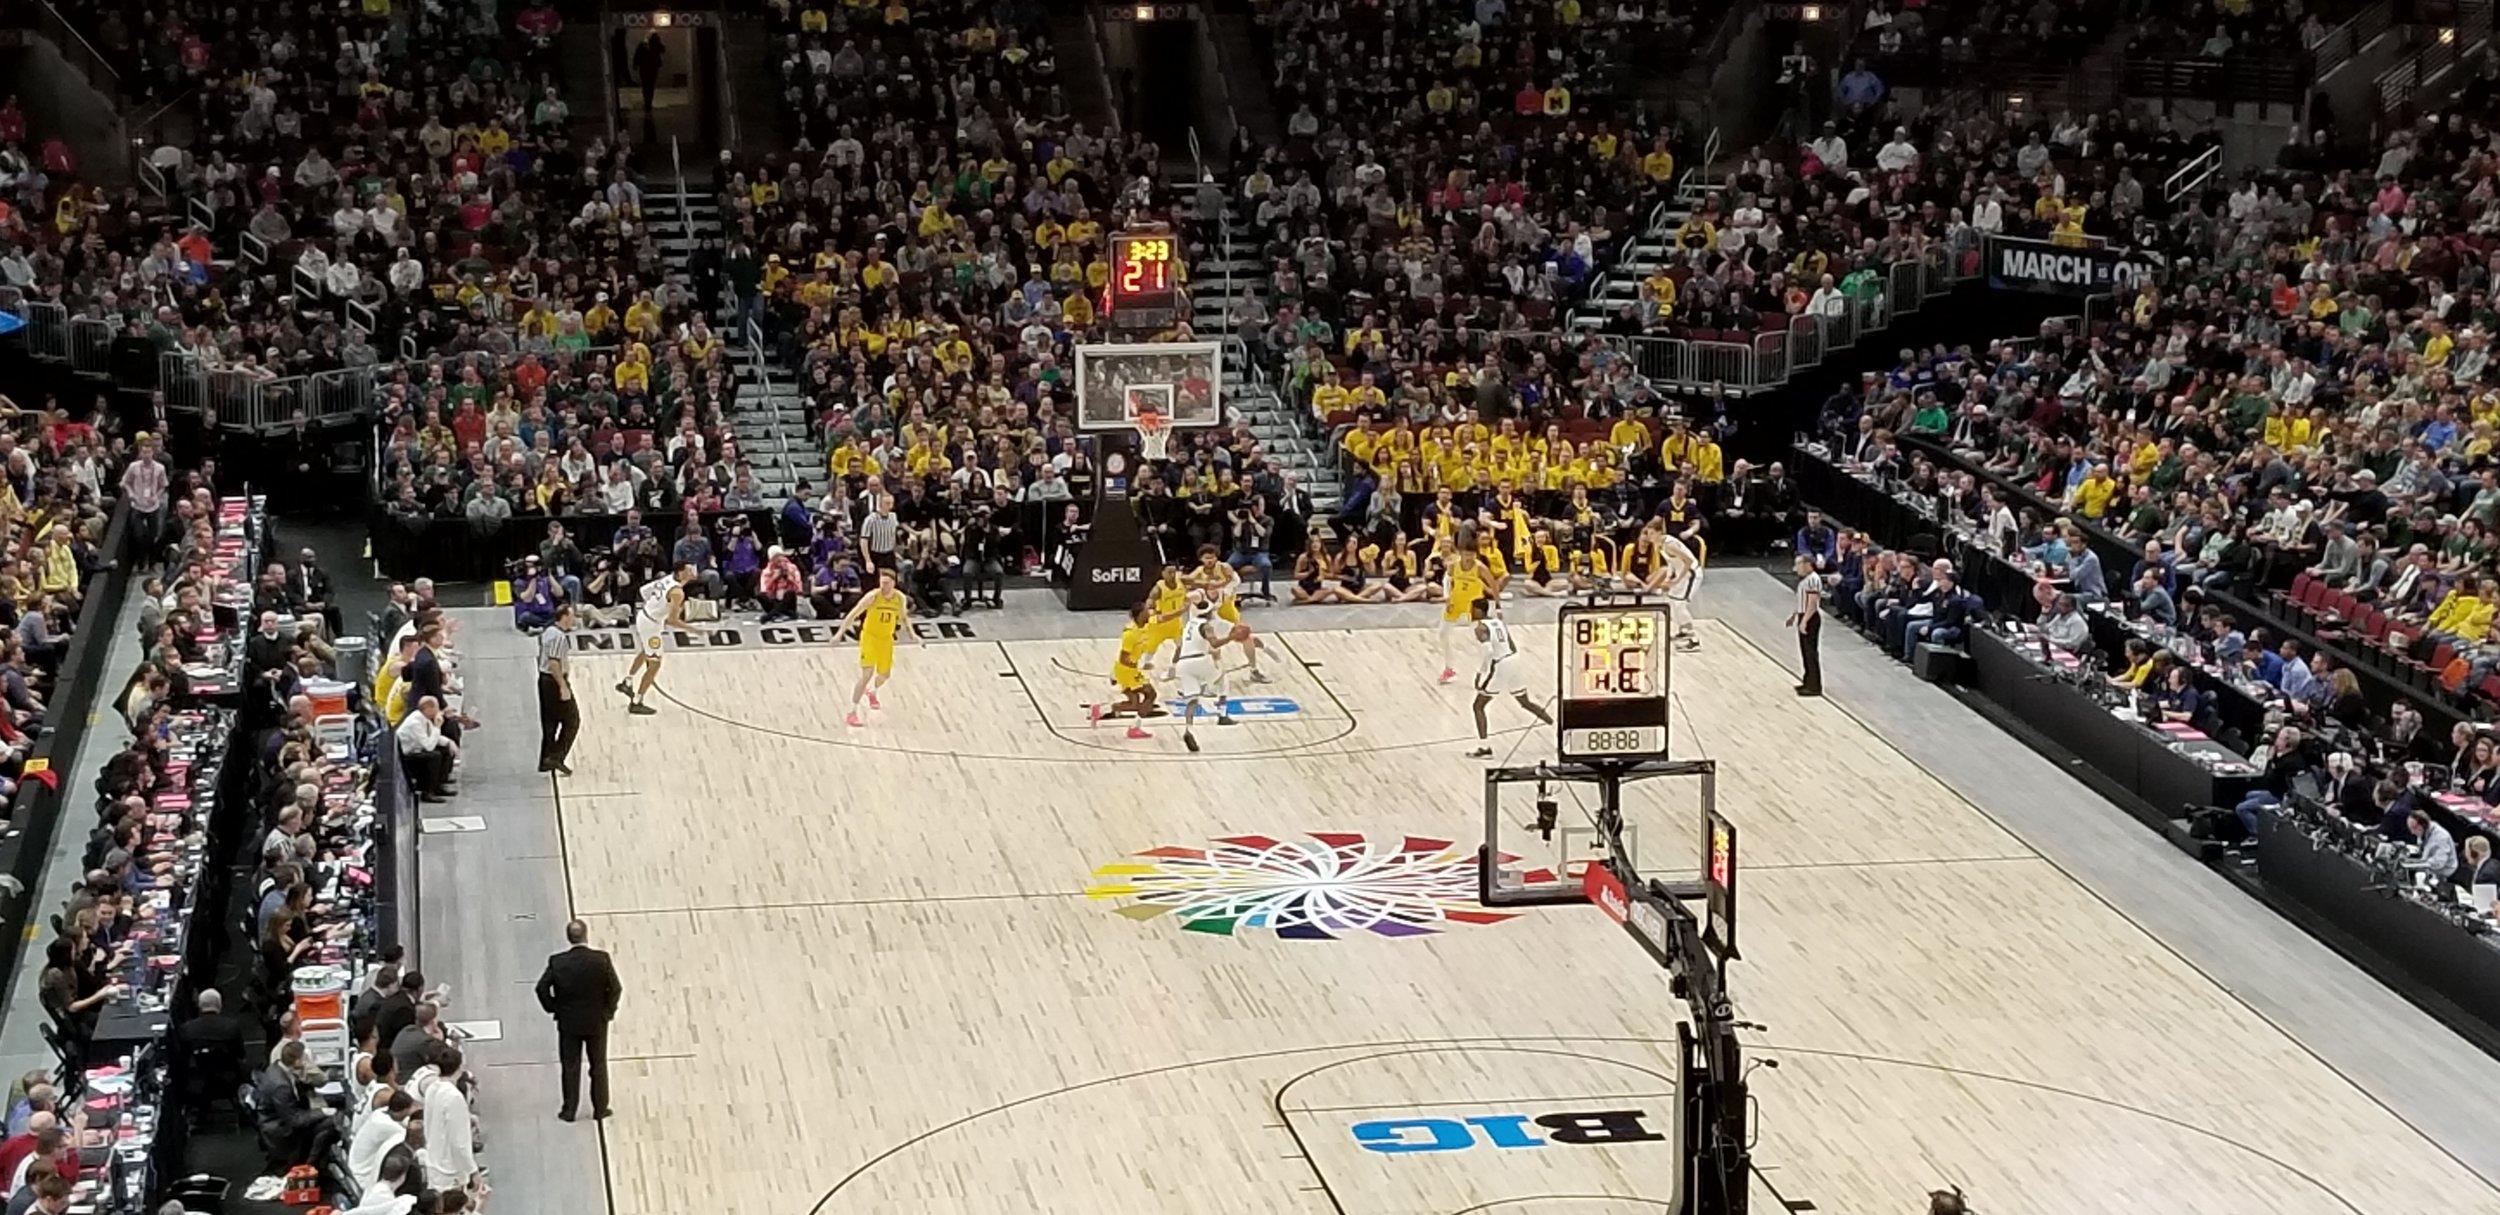 Michigan vs. Michigan State for the Big Ten Championship